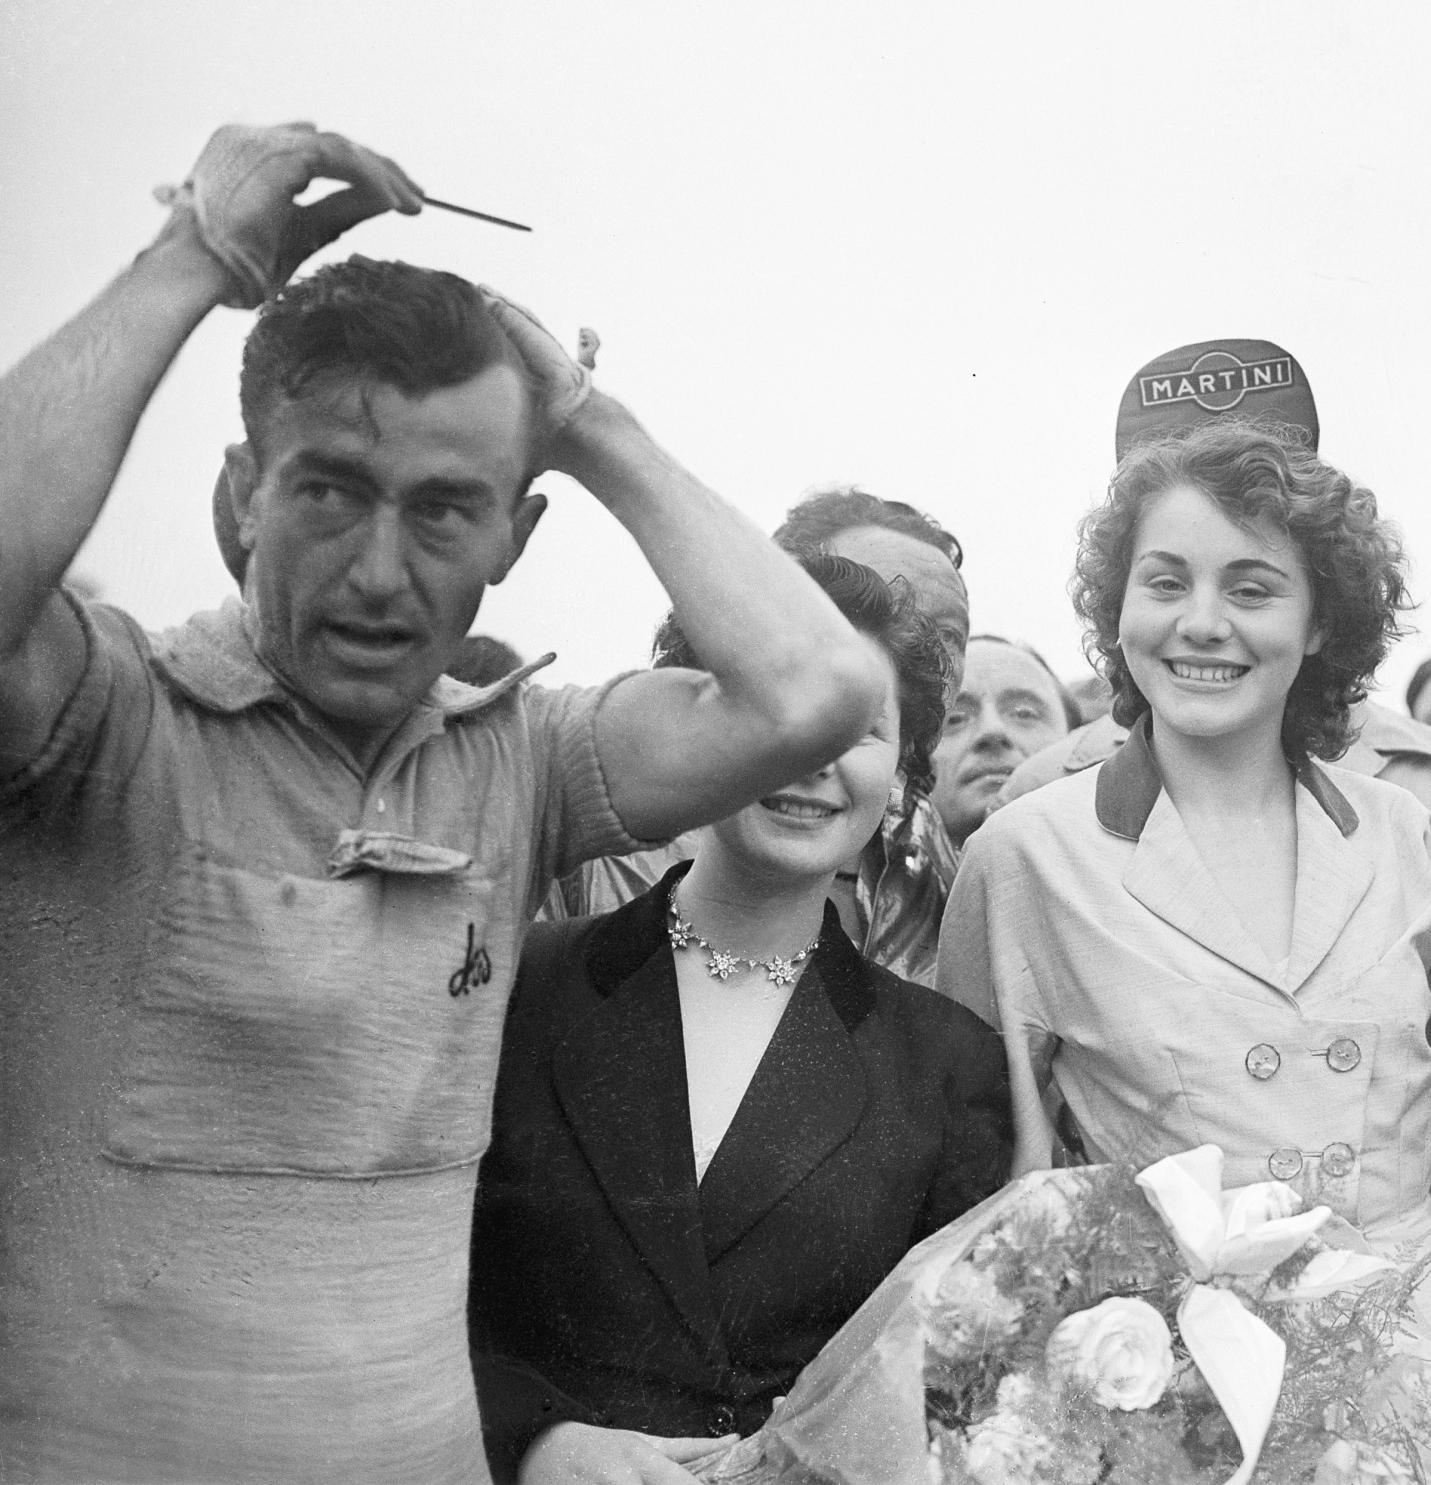 Louison Bobet en el Tour de 1954, acicalándonse para el final de etapa (foto: Corbis)